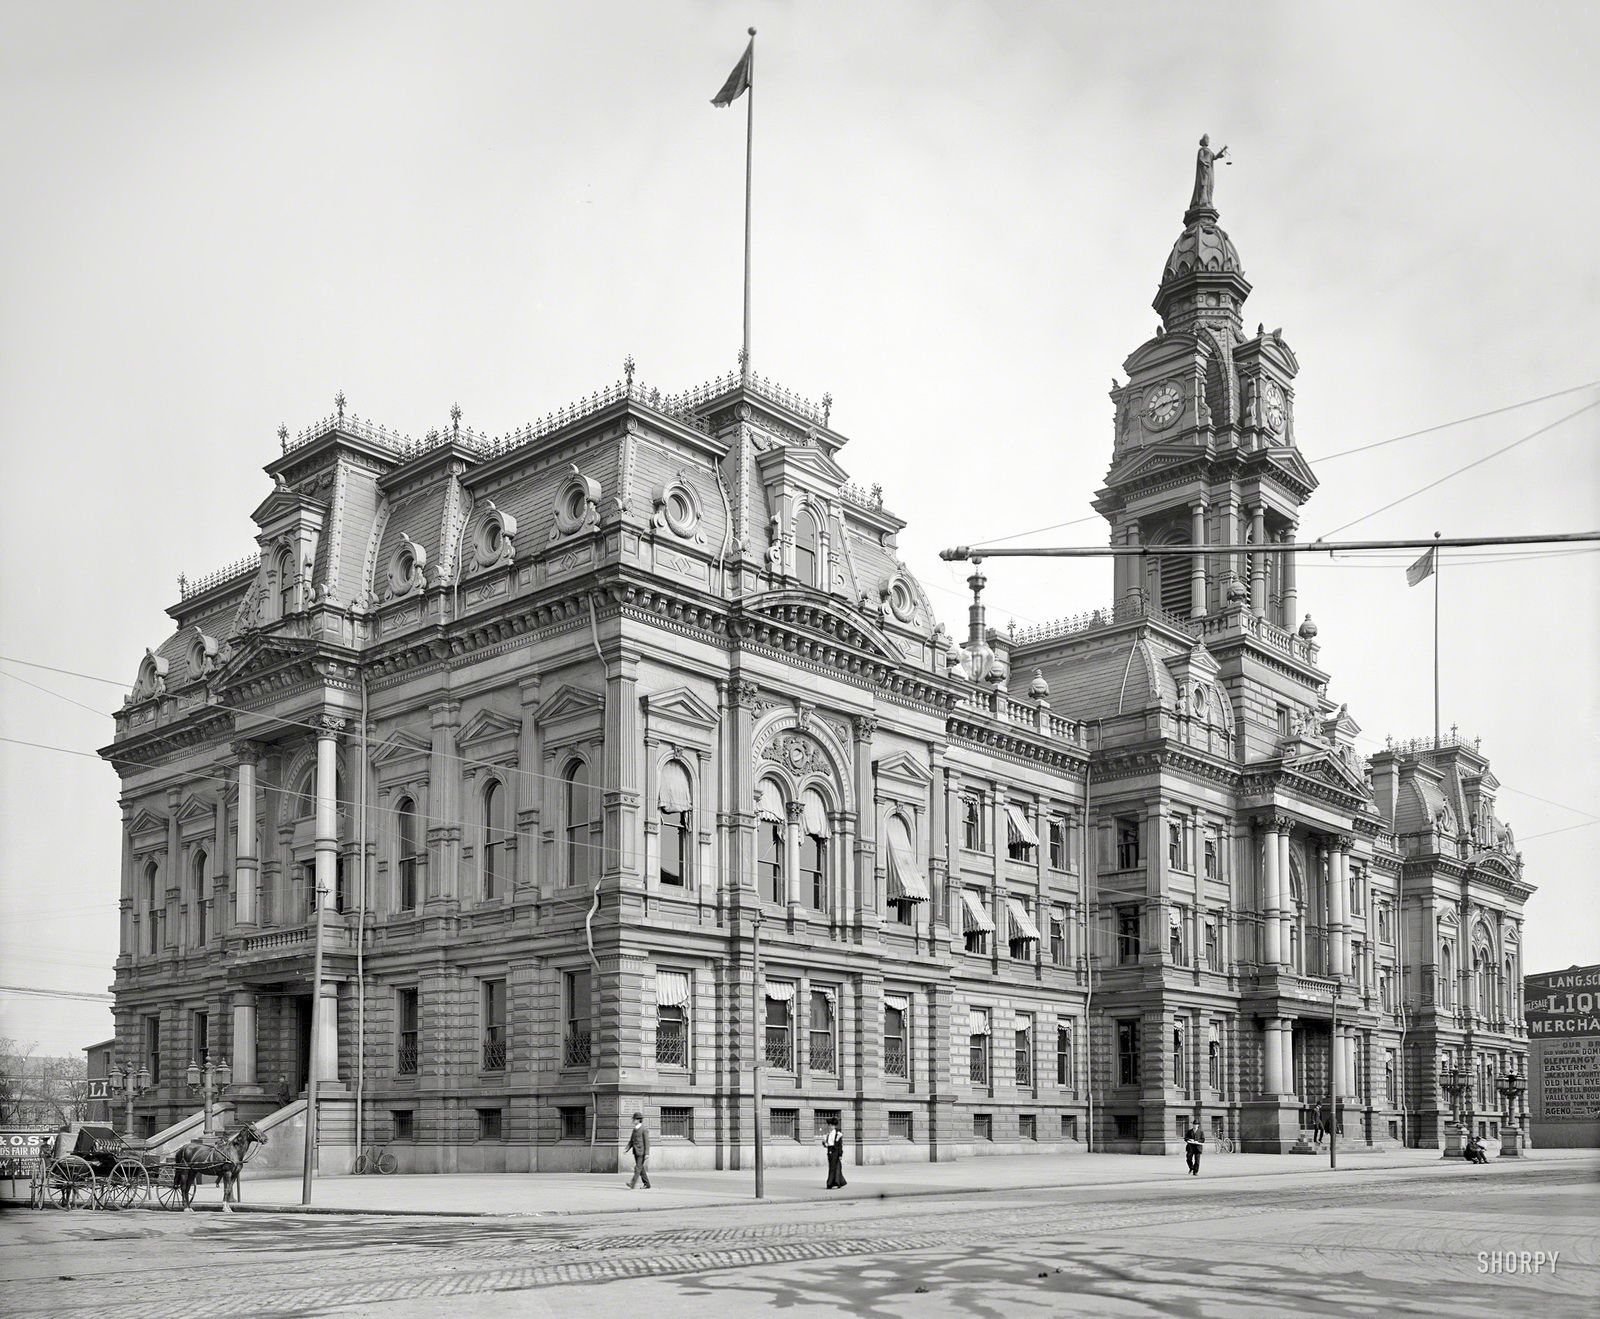 Суд округа Франклин, Колумбус. Построено в 1887 году ...